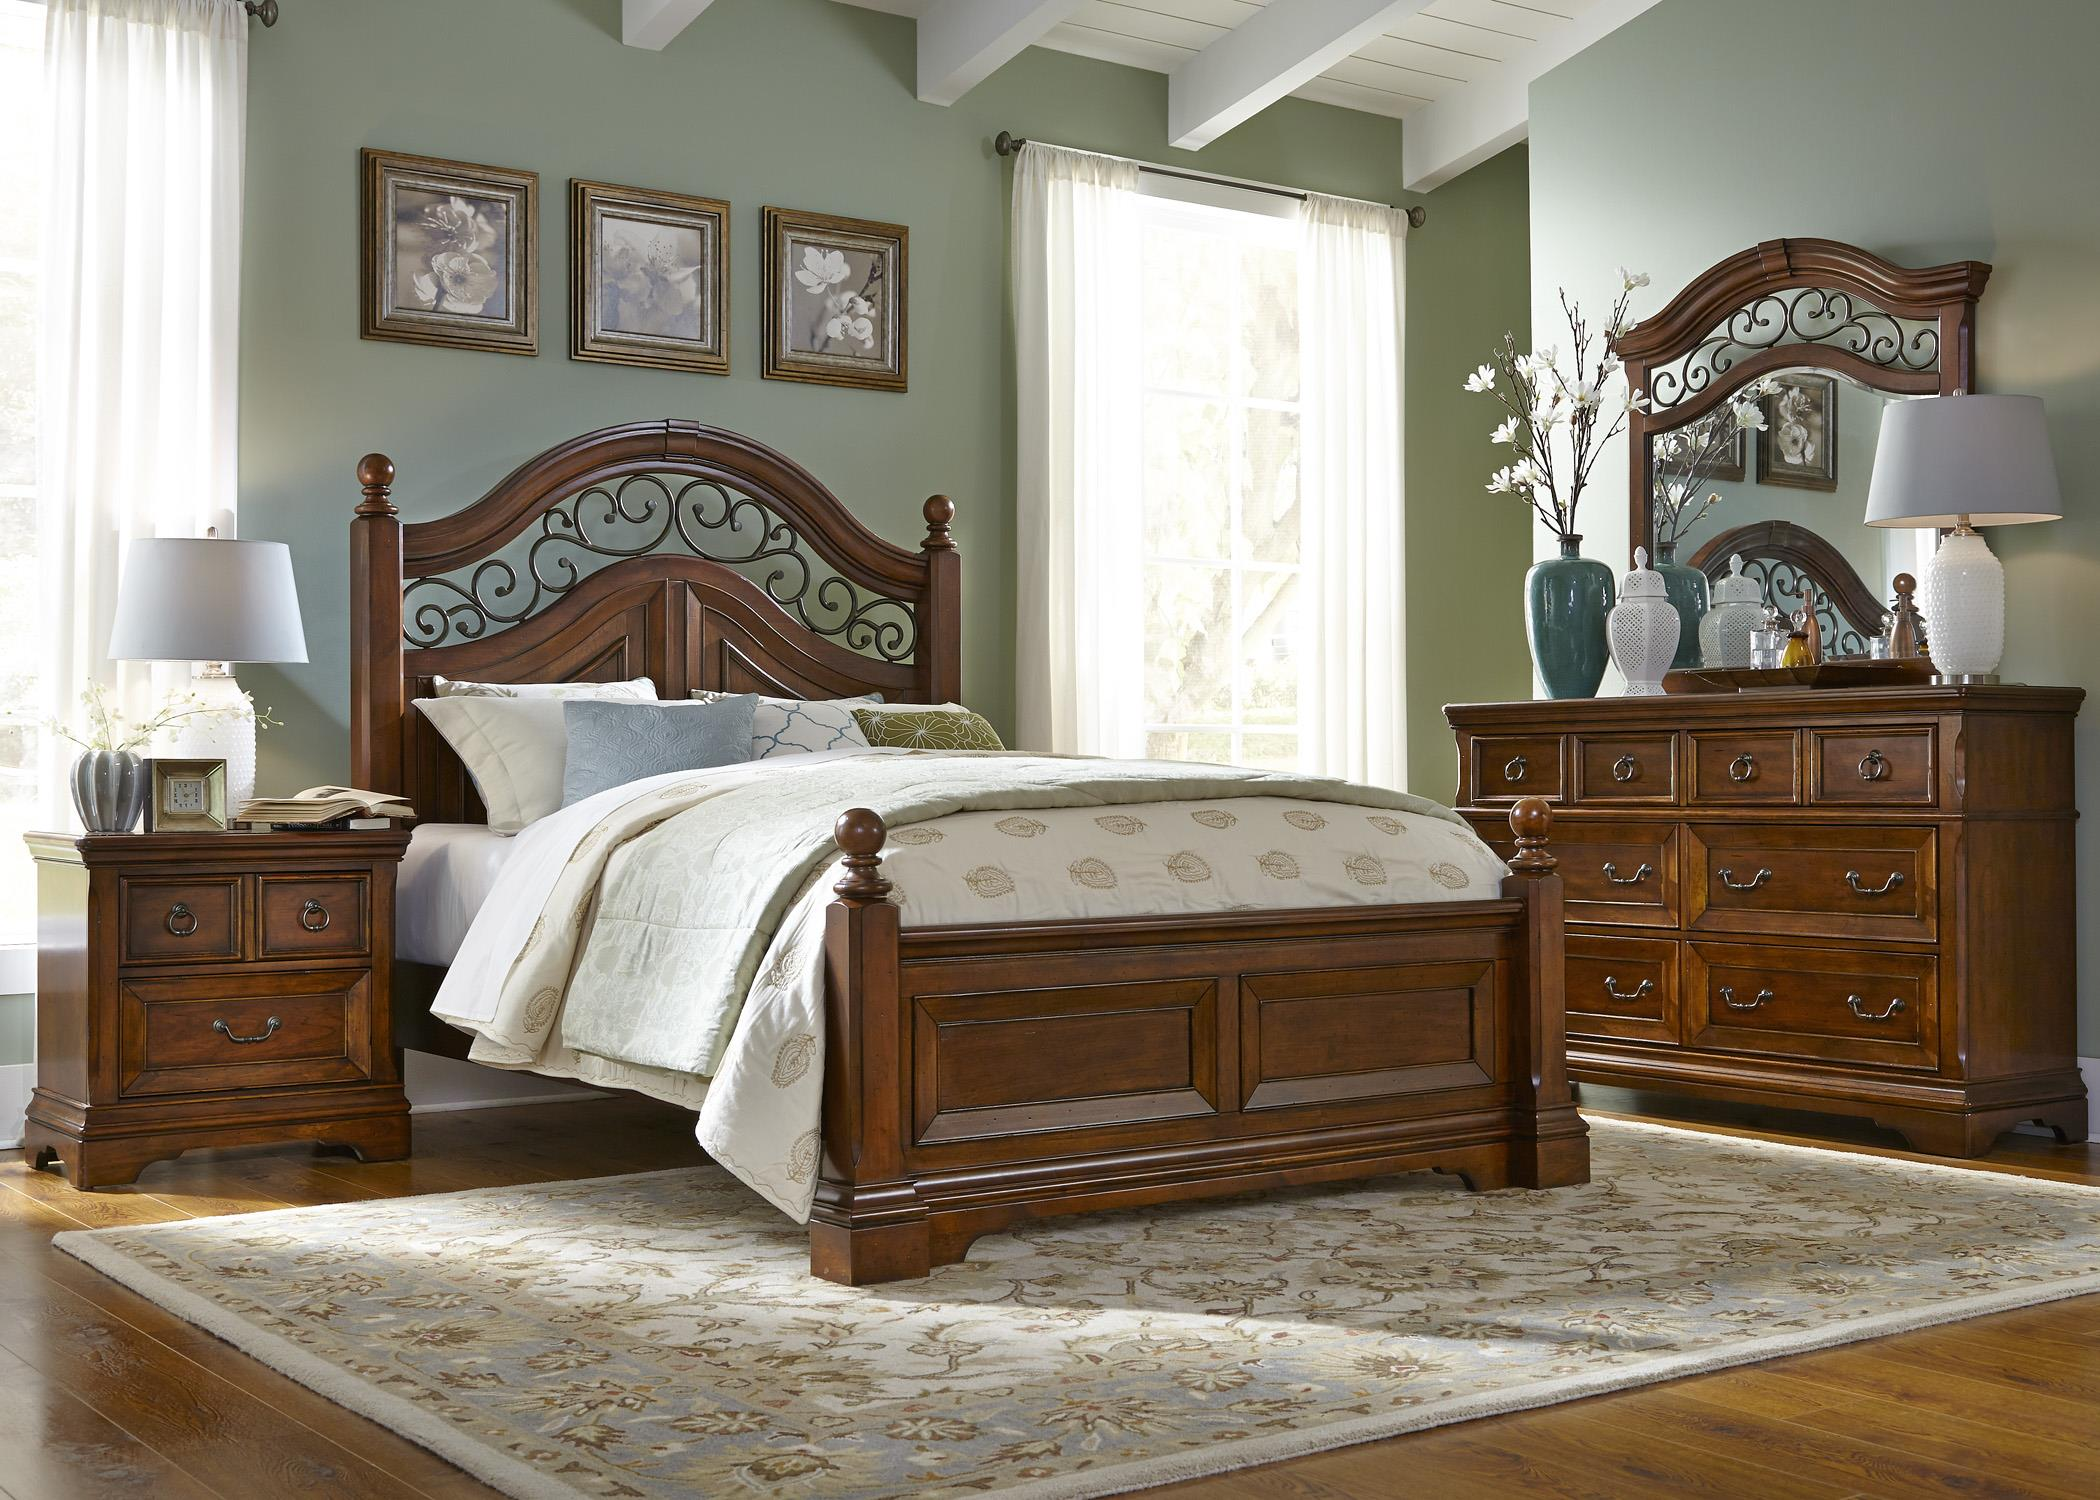 Liberty Furniture Laurelwood Queen Poster Bed, Dresser & Mirror, N/S - Item Number: 547-BR-GP27